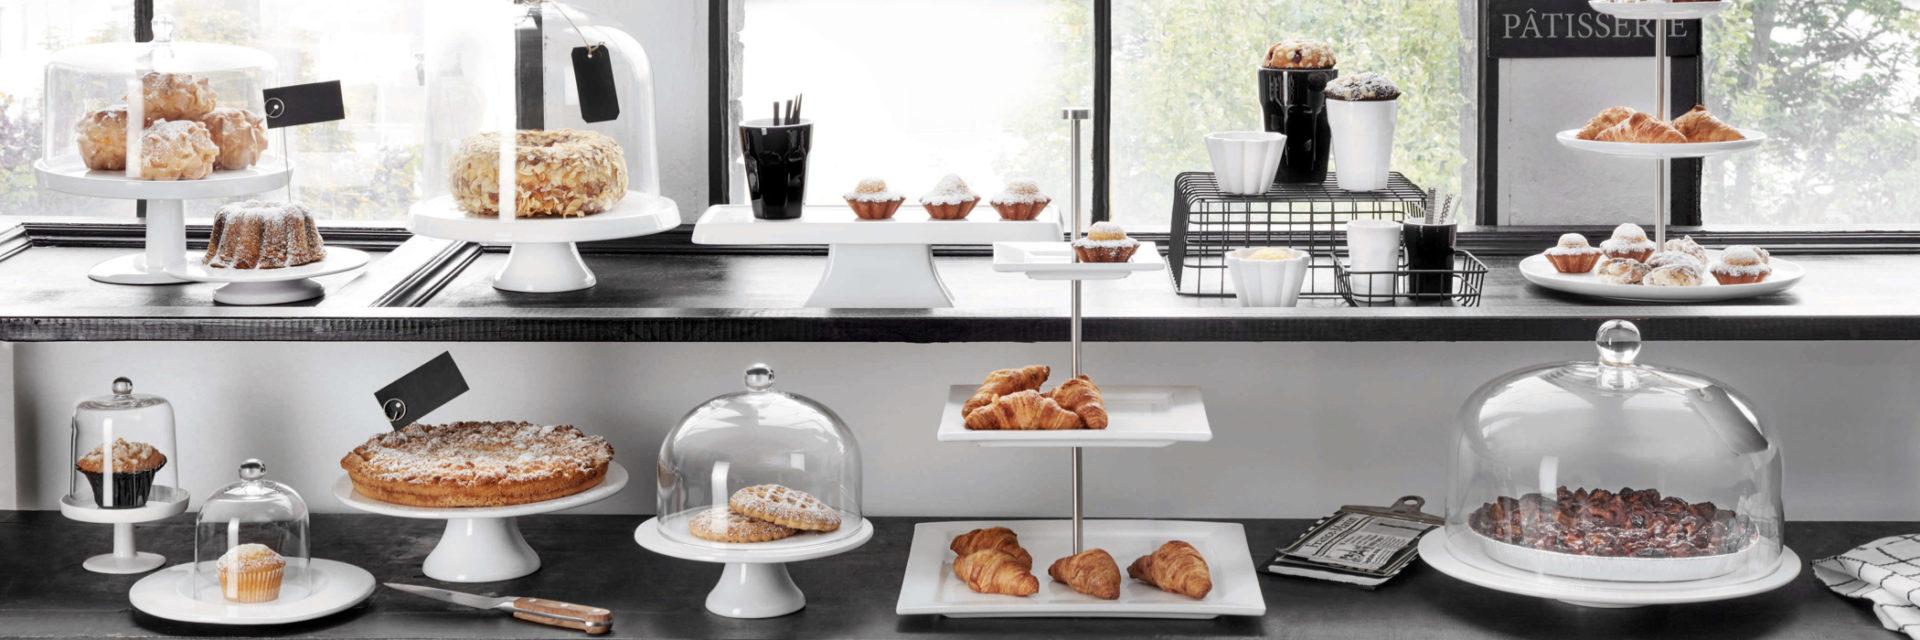 Etagere, Tortenplatte & Glasglocke